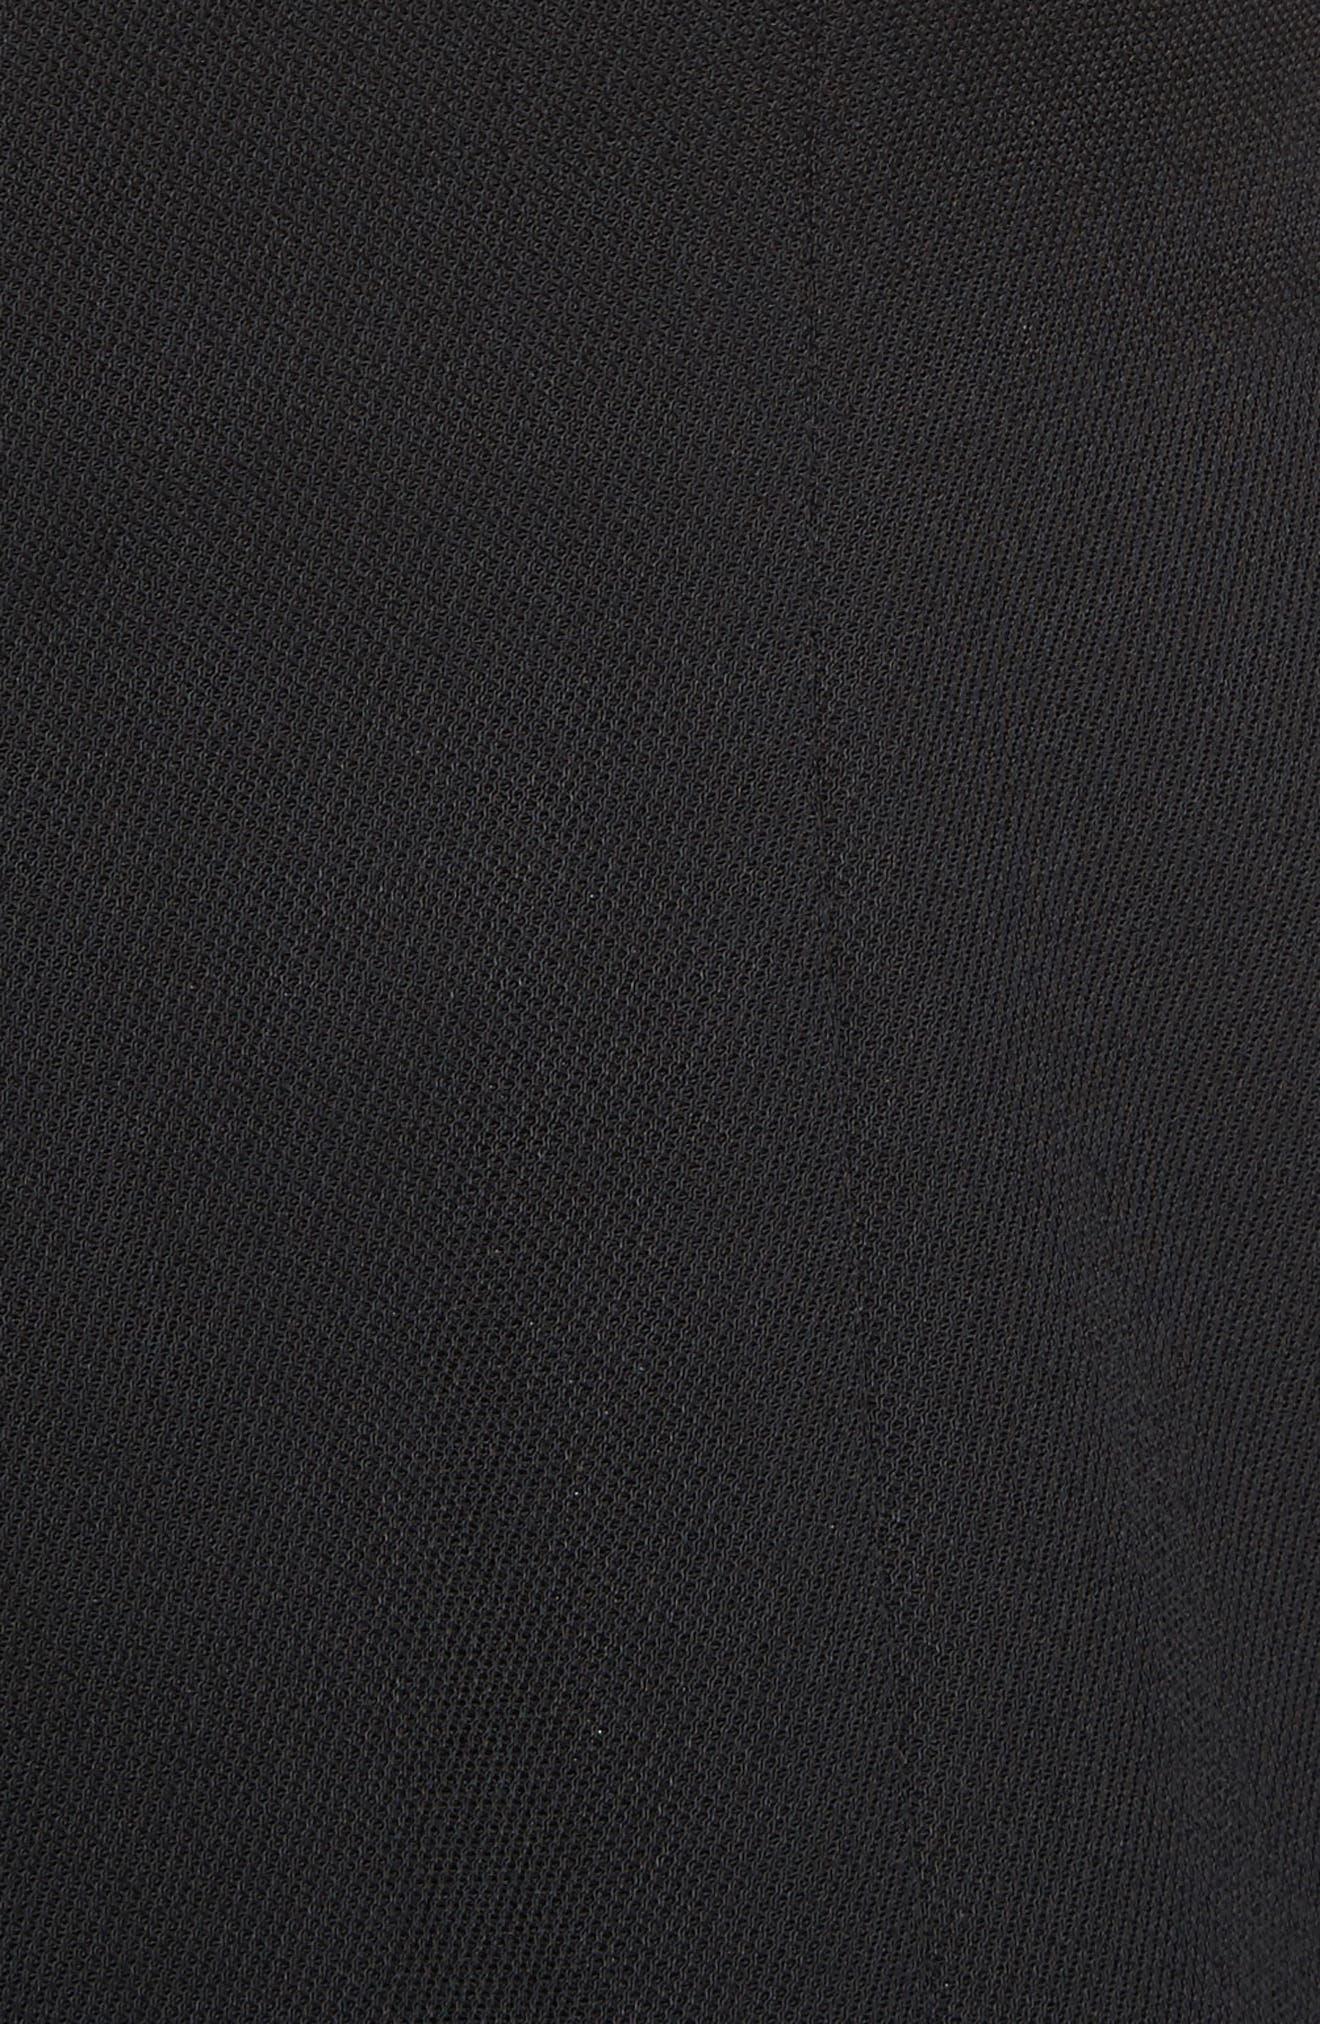 Mixed Media V-Neck Dress,                             Alternate thumbnail 3, color,                             Black